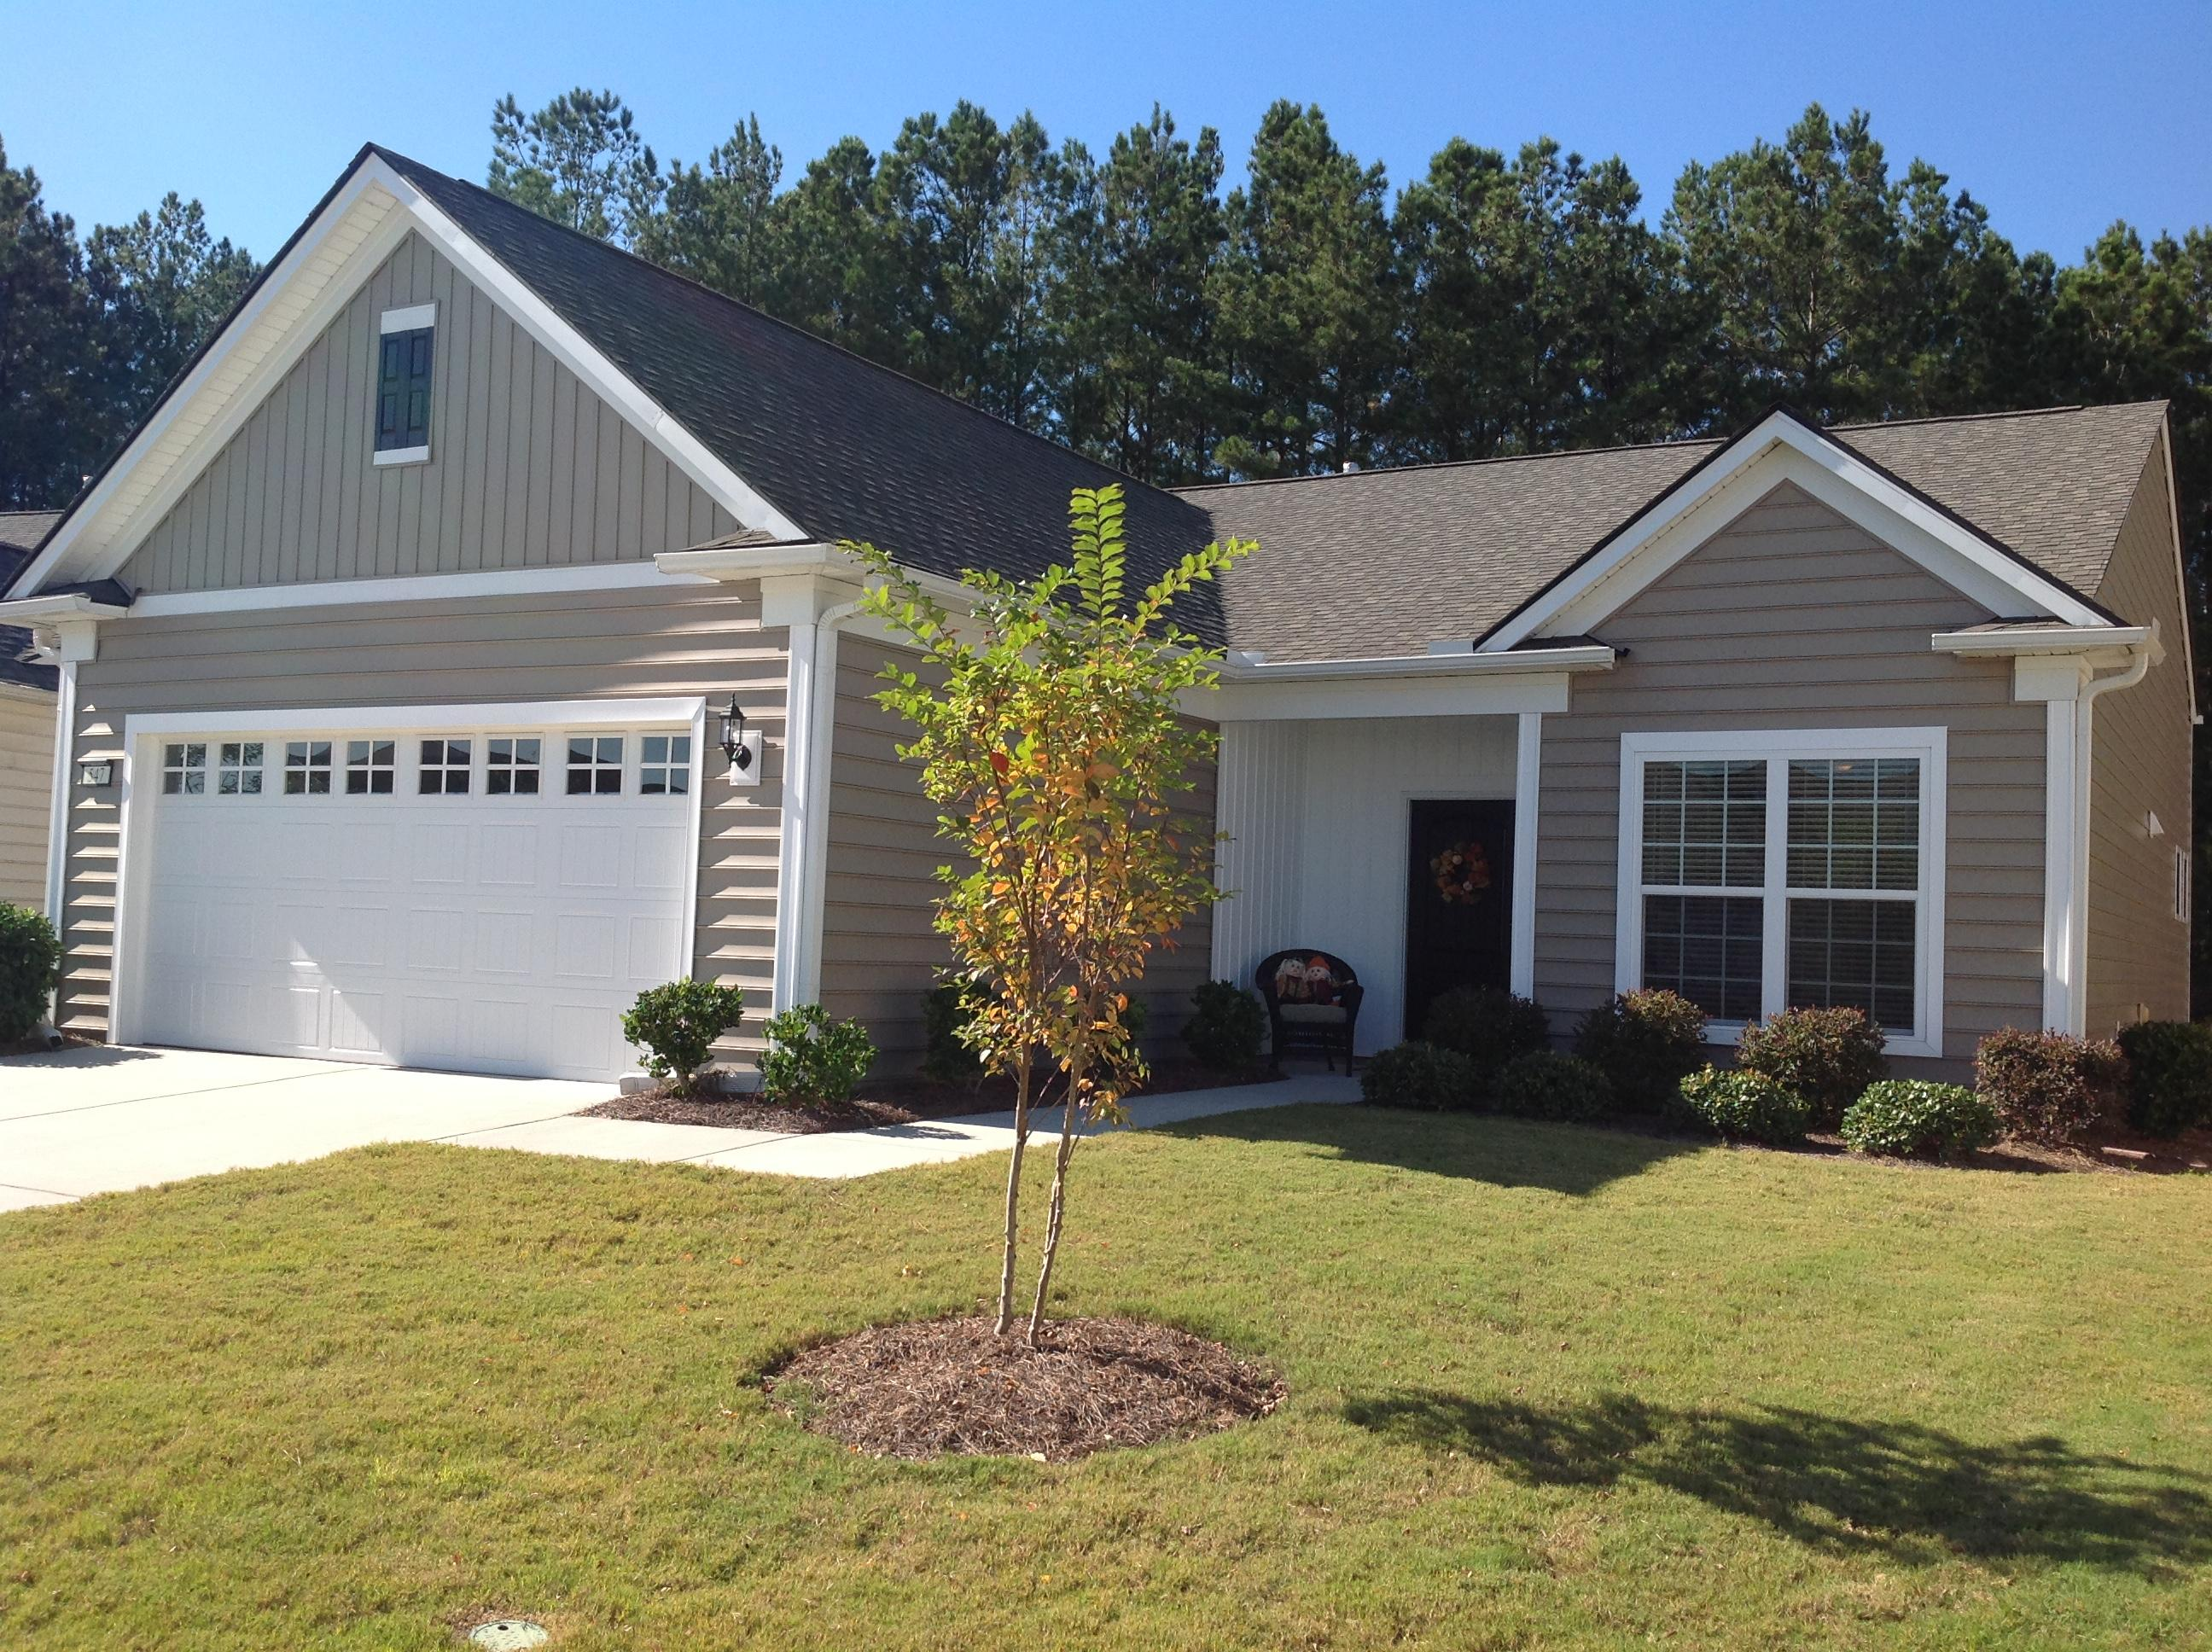 Cane Bay Plantation Homes For Sale - 547 Eastern Isle, Summerville, SC - 0